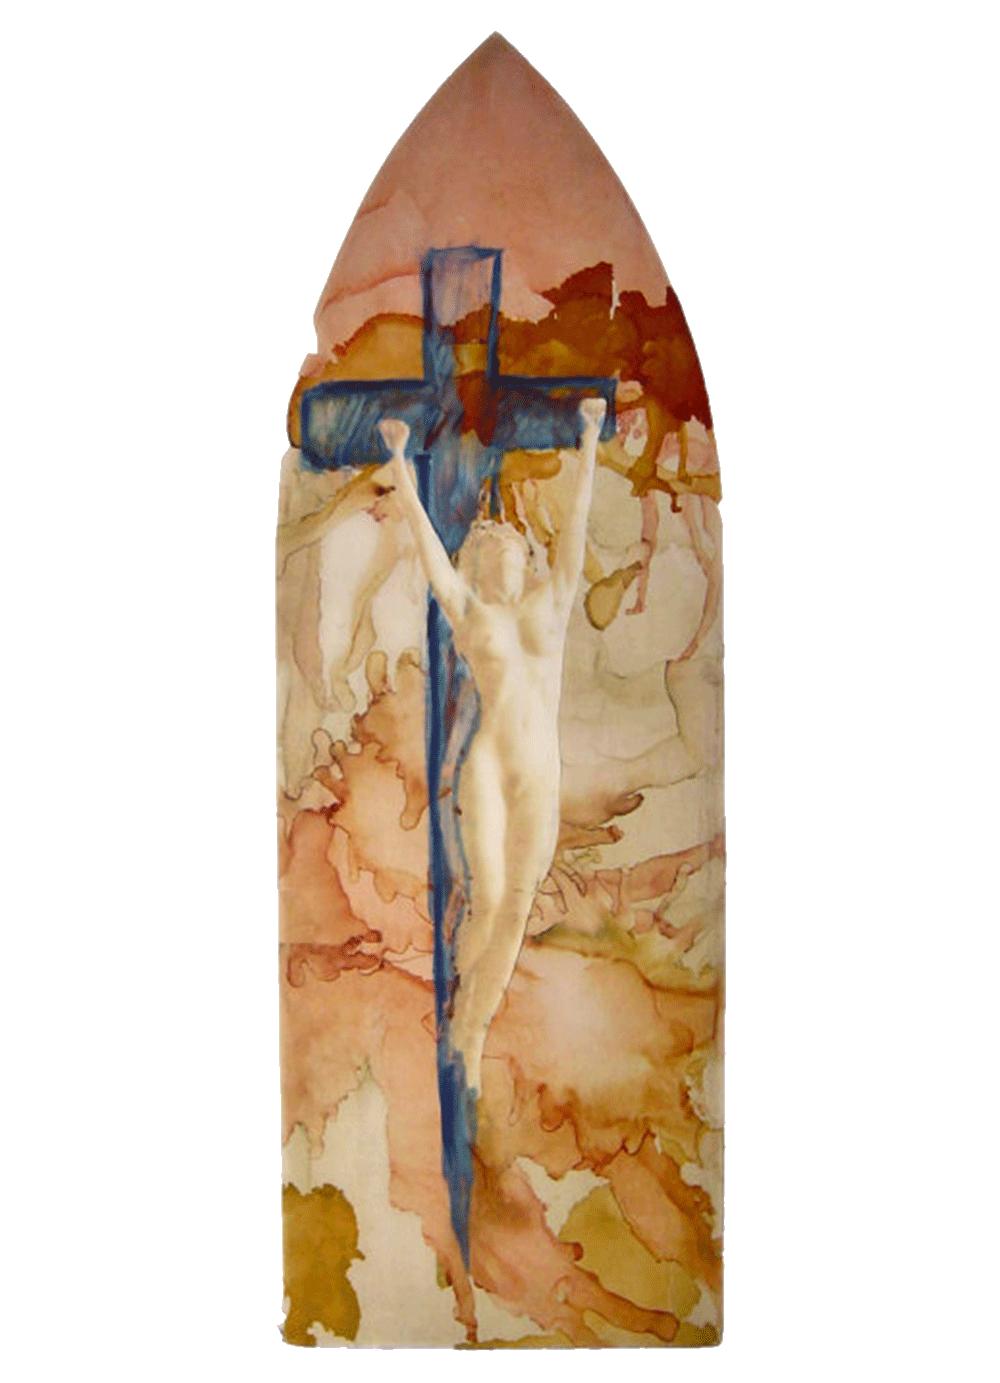 Pintura-Cruxificcion-2-RD.Escultor